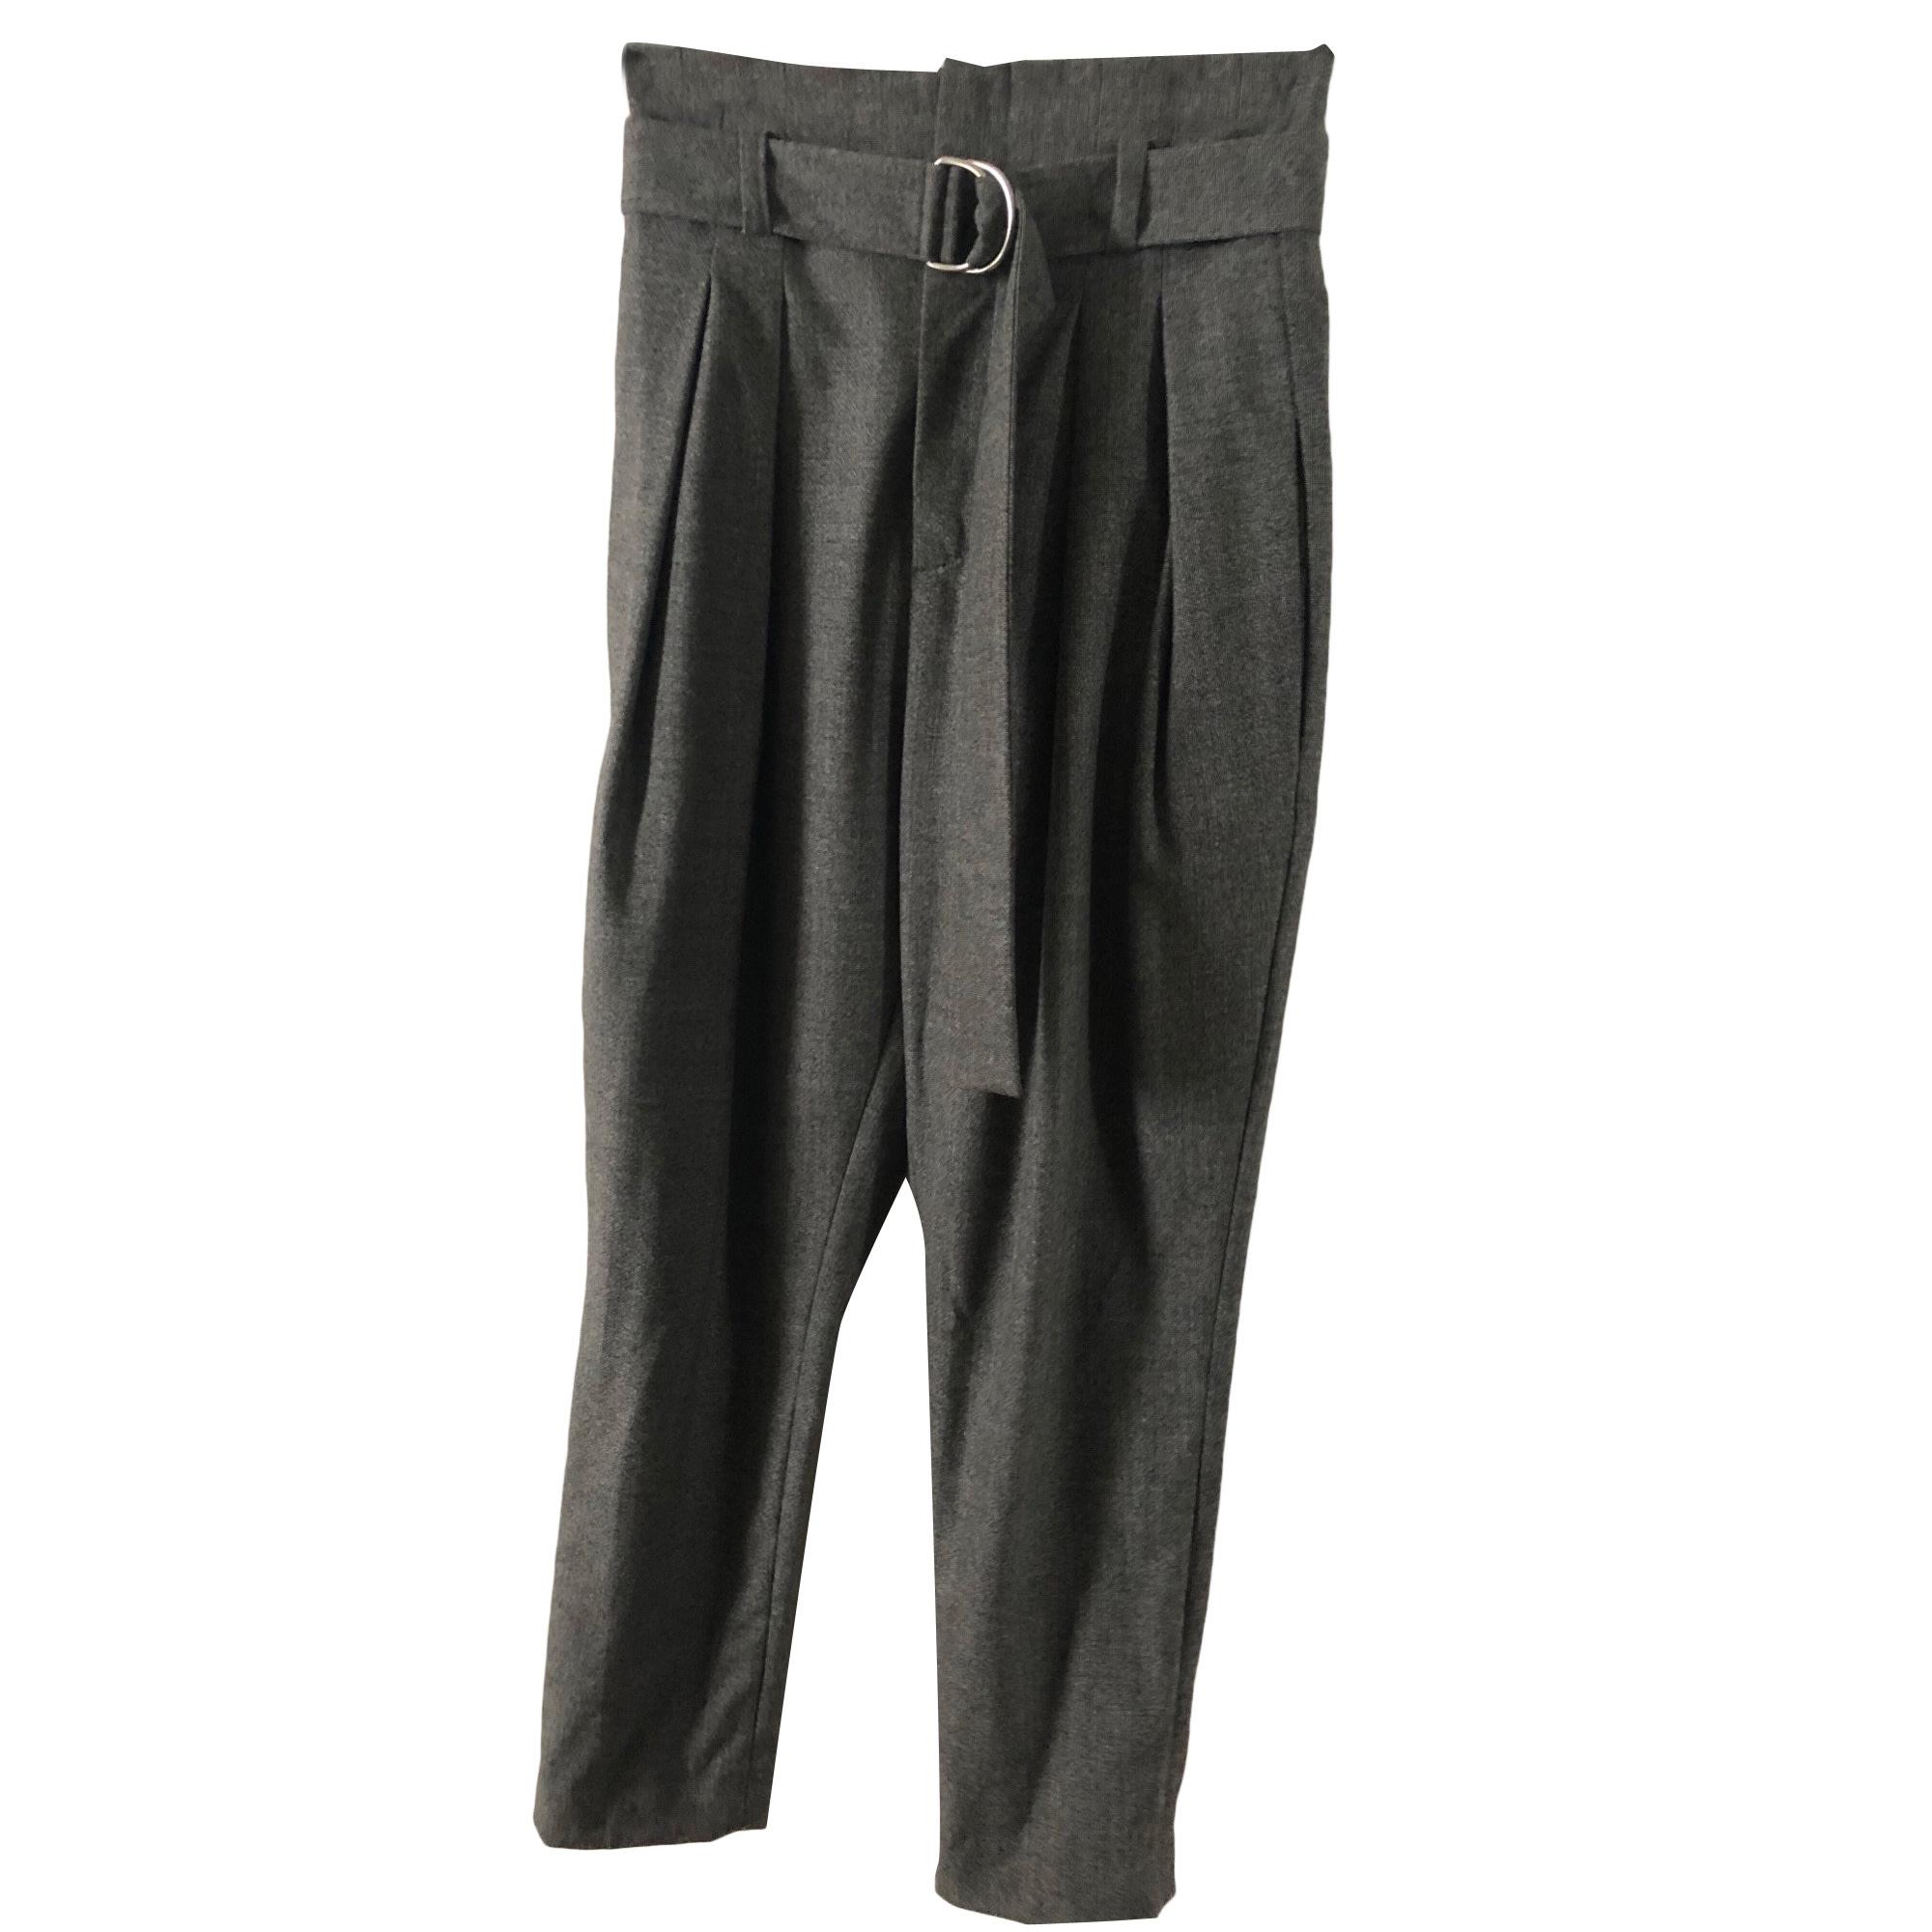 Pantalon carotte IRO Gris, anthracite